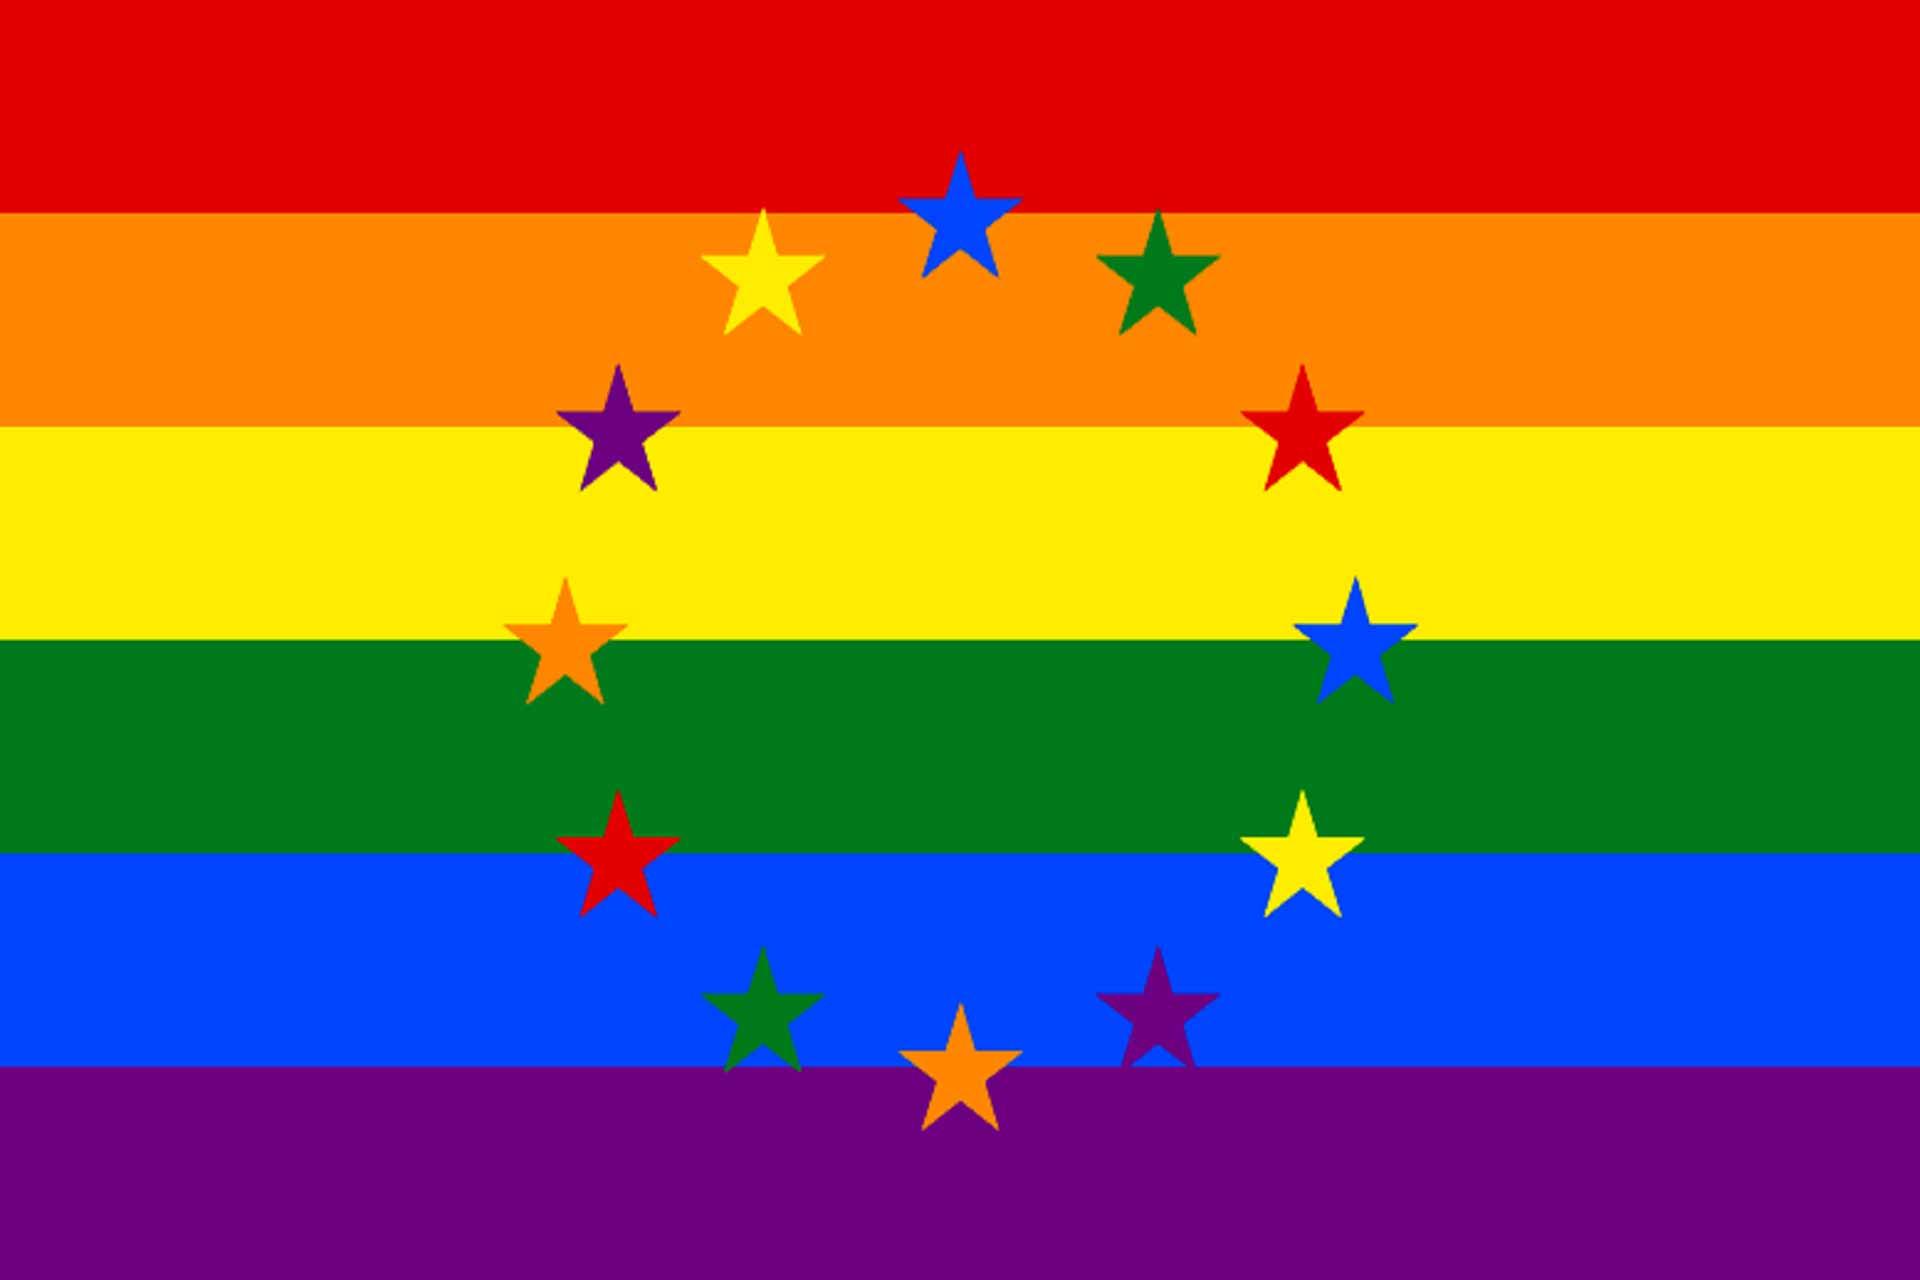 Pride Month of global LGBT communities. United in diversity!